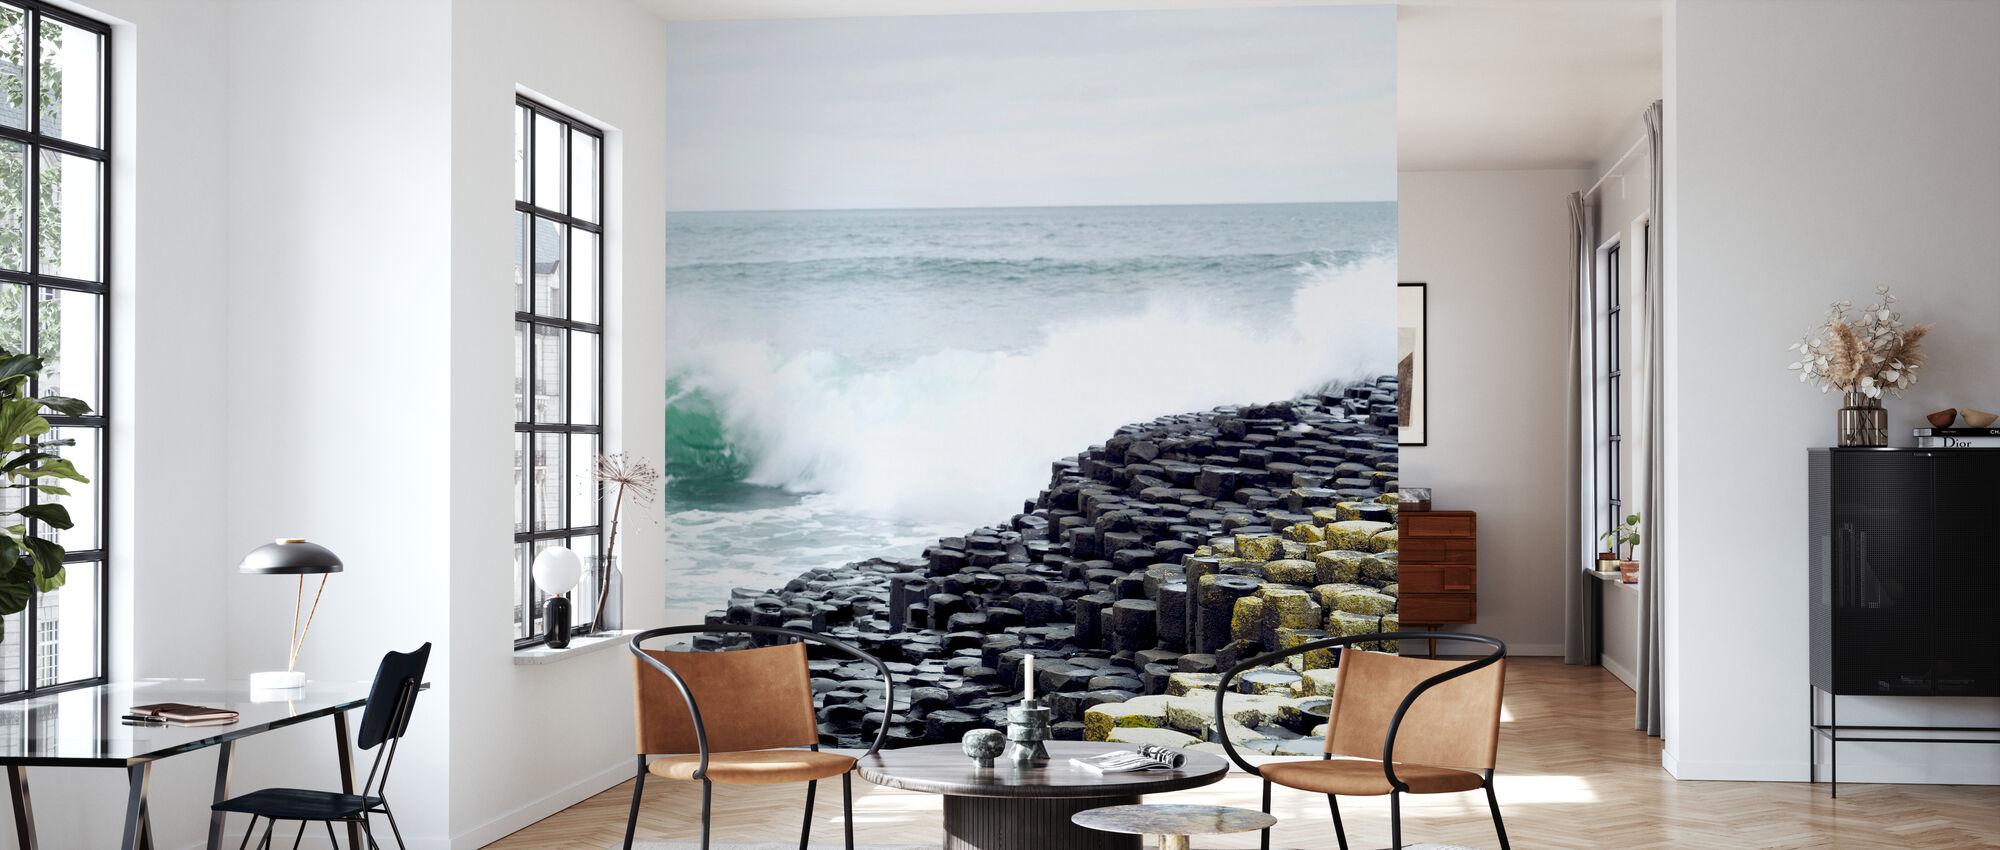 Waves Crashing in Giants Causeway - Wallpaper - Living Room